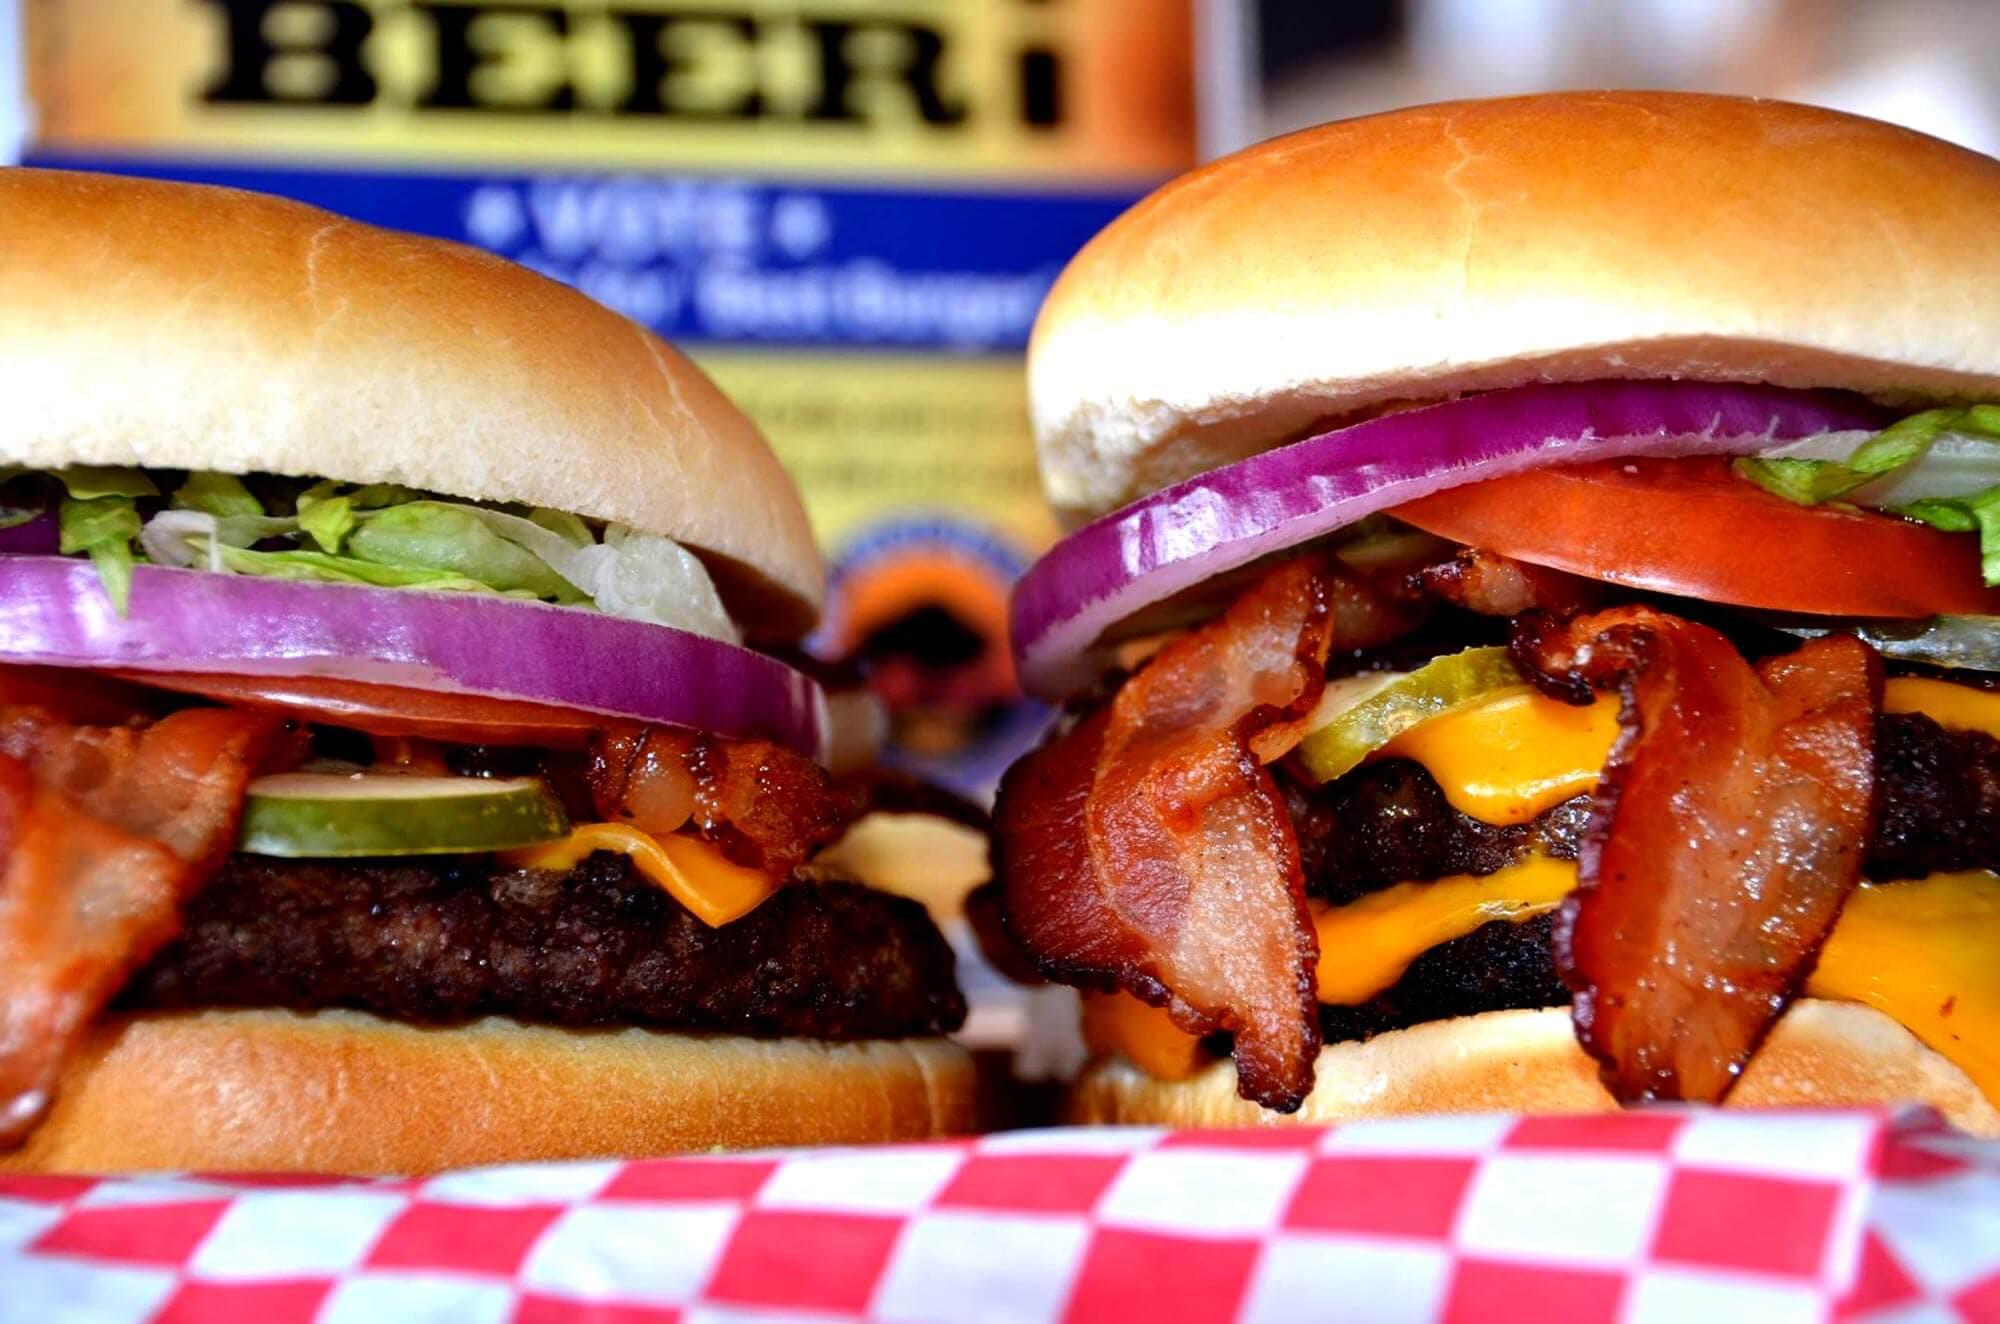 Caprock Cafe Burger with Purple Onion